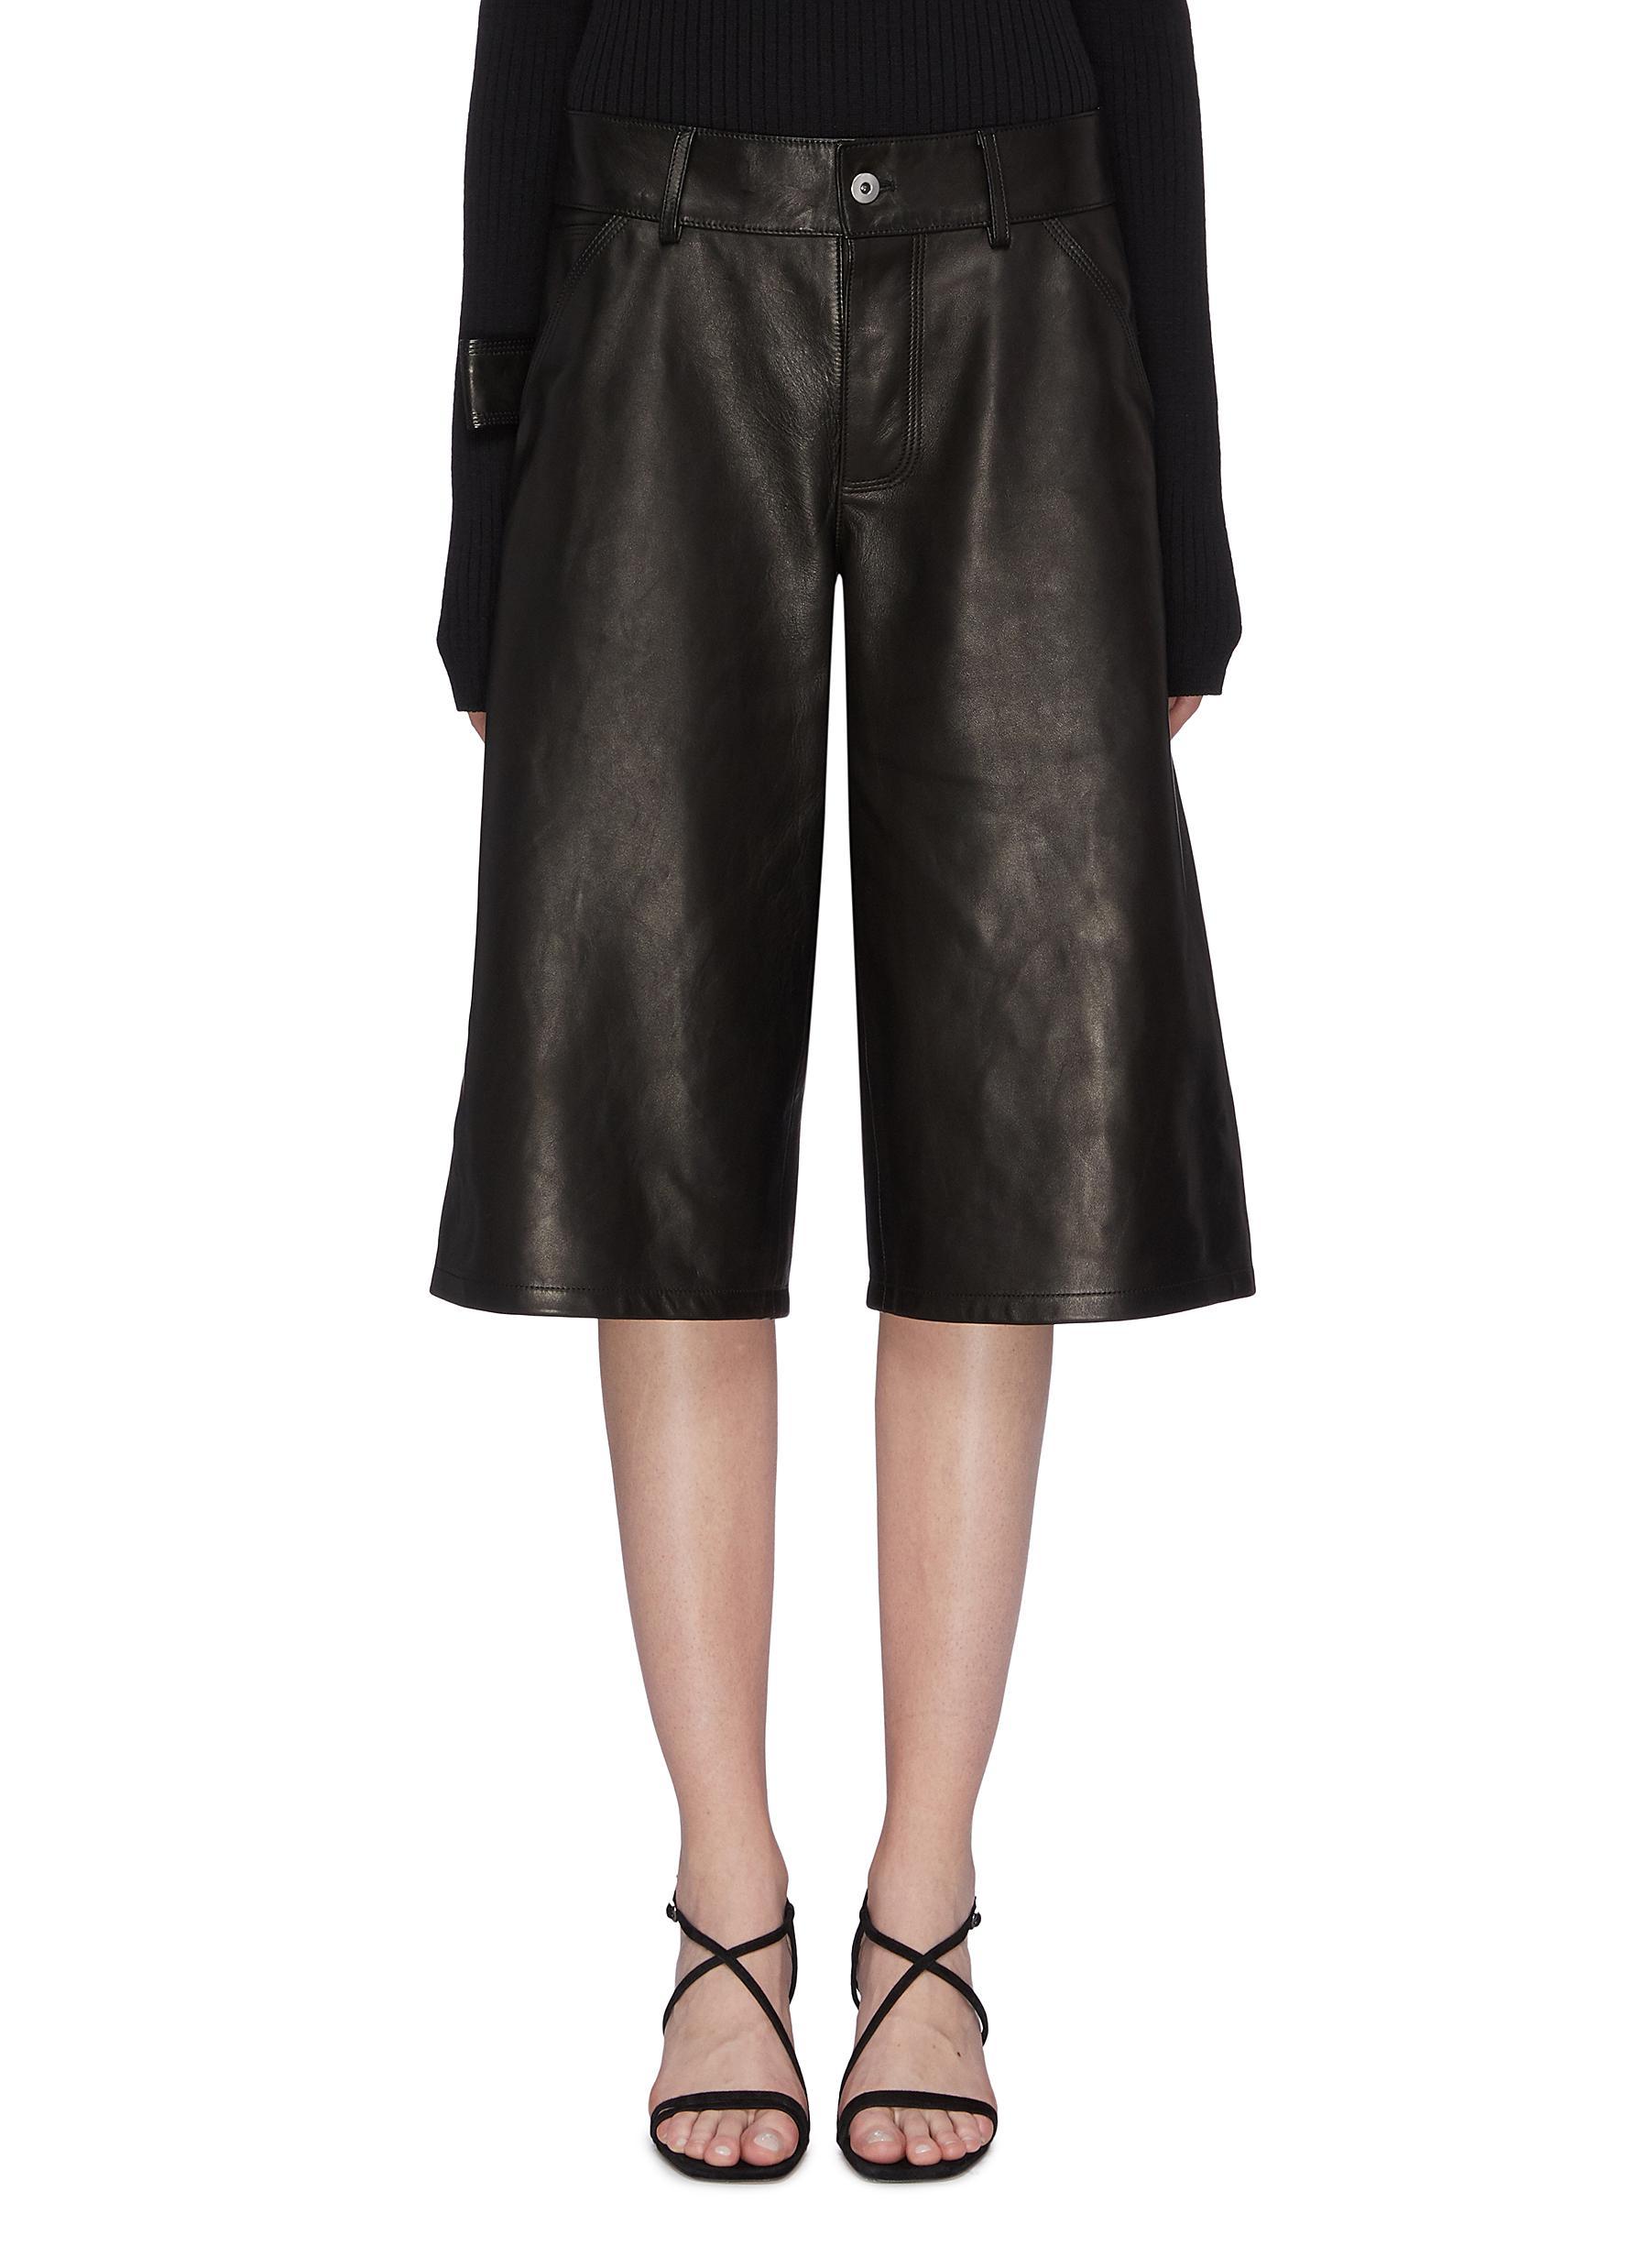 Buy Bottega Veneta Pants & Shorts Leather cargo culottes